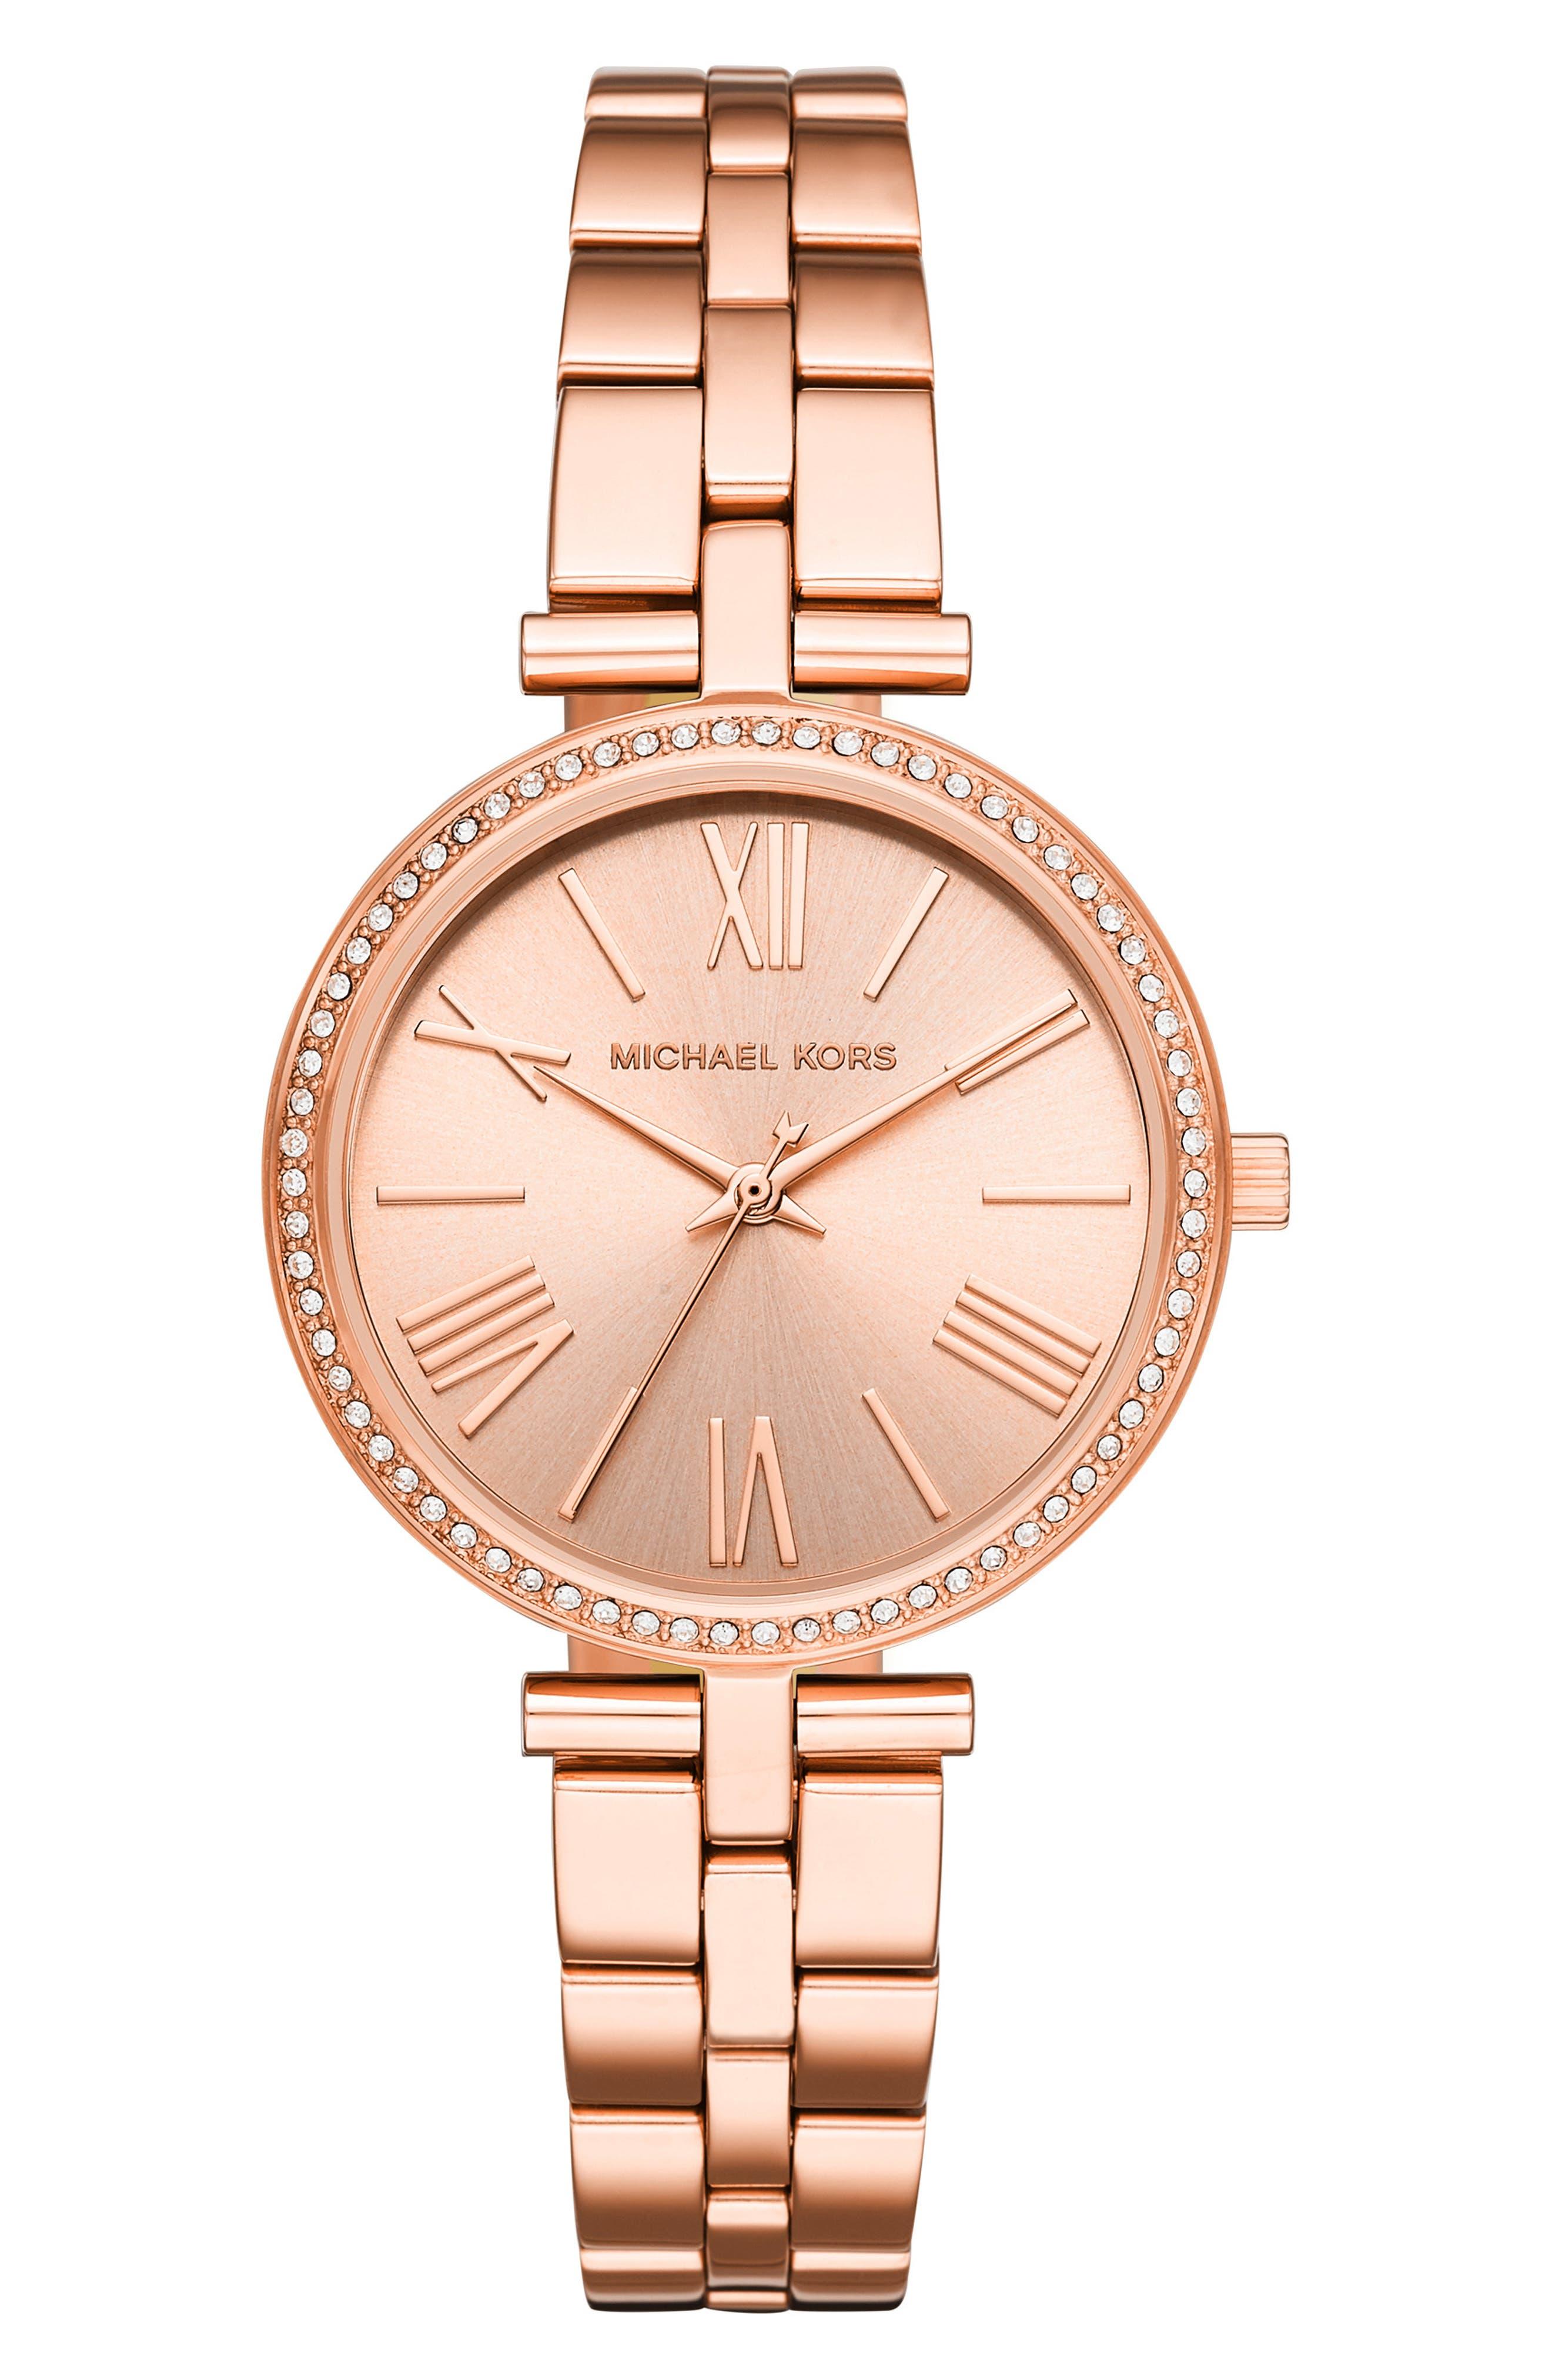 MICHAEL KORS Maci Bracelet Watch, 34mm, Main, color, ROSE GOLD